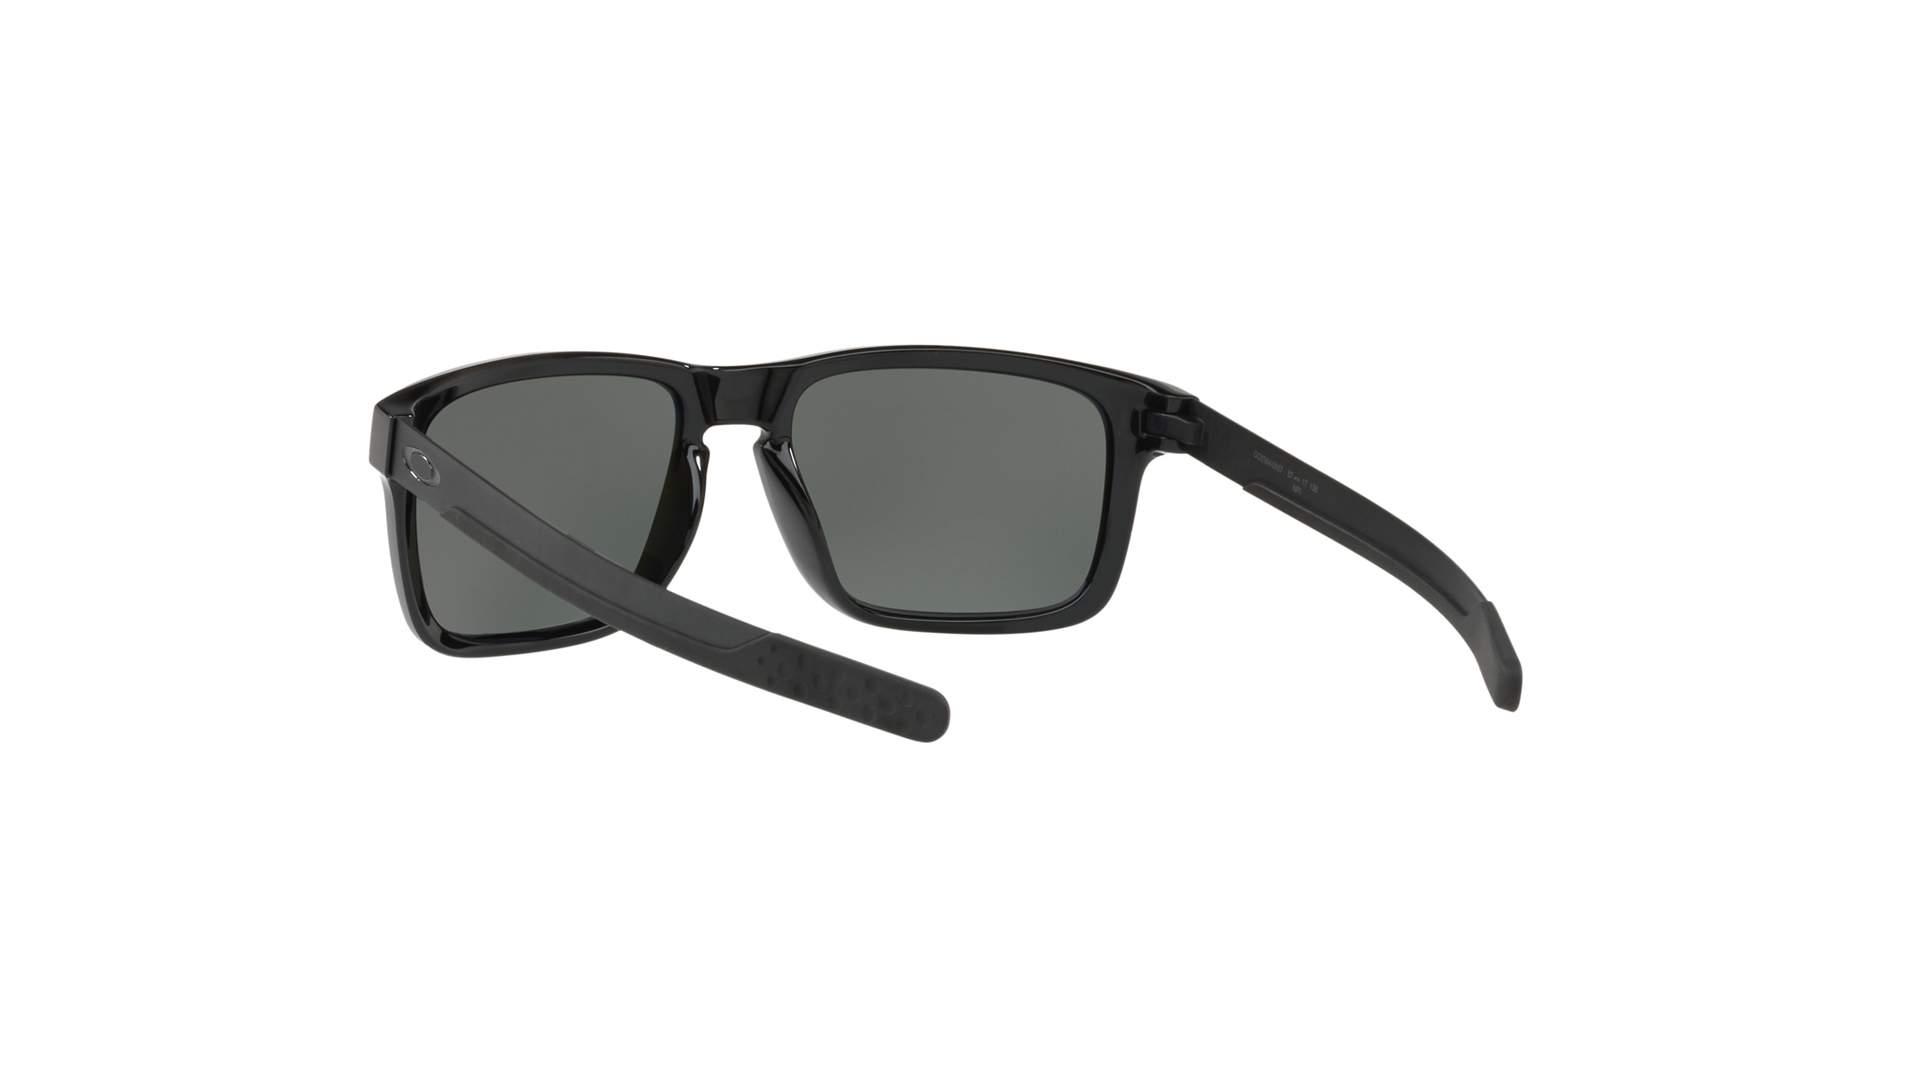 4c3c7ef15a Sunglasses Oakley Holbrook Mix Black Prizm OO9384 06 57-17 Large Polarized  Mirror